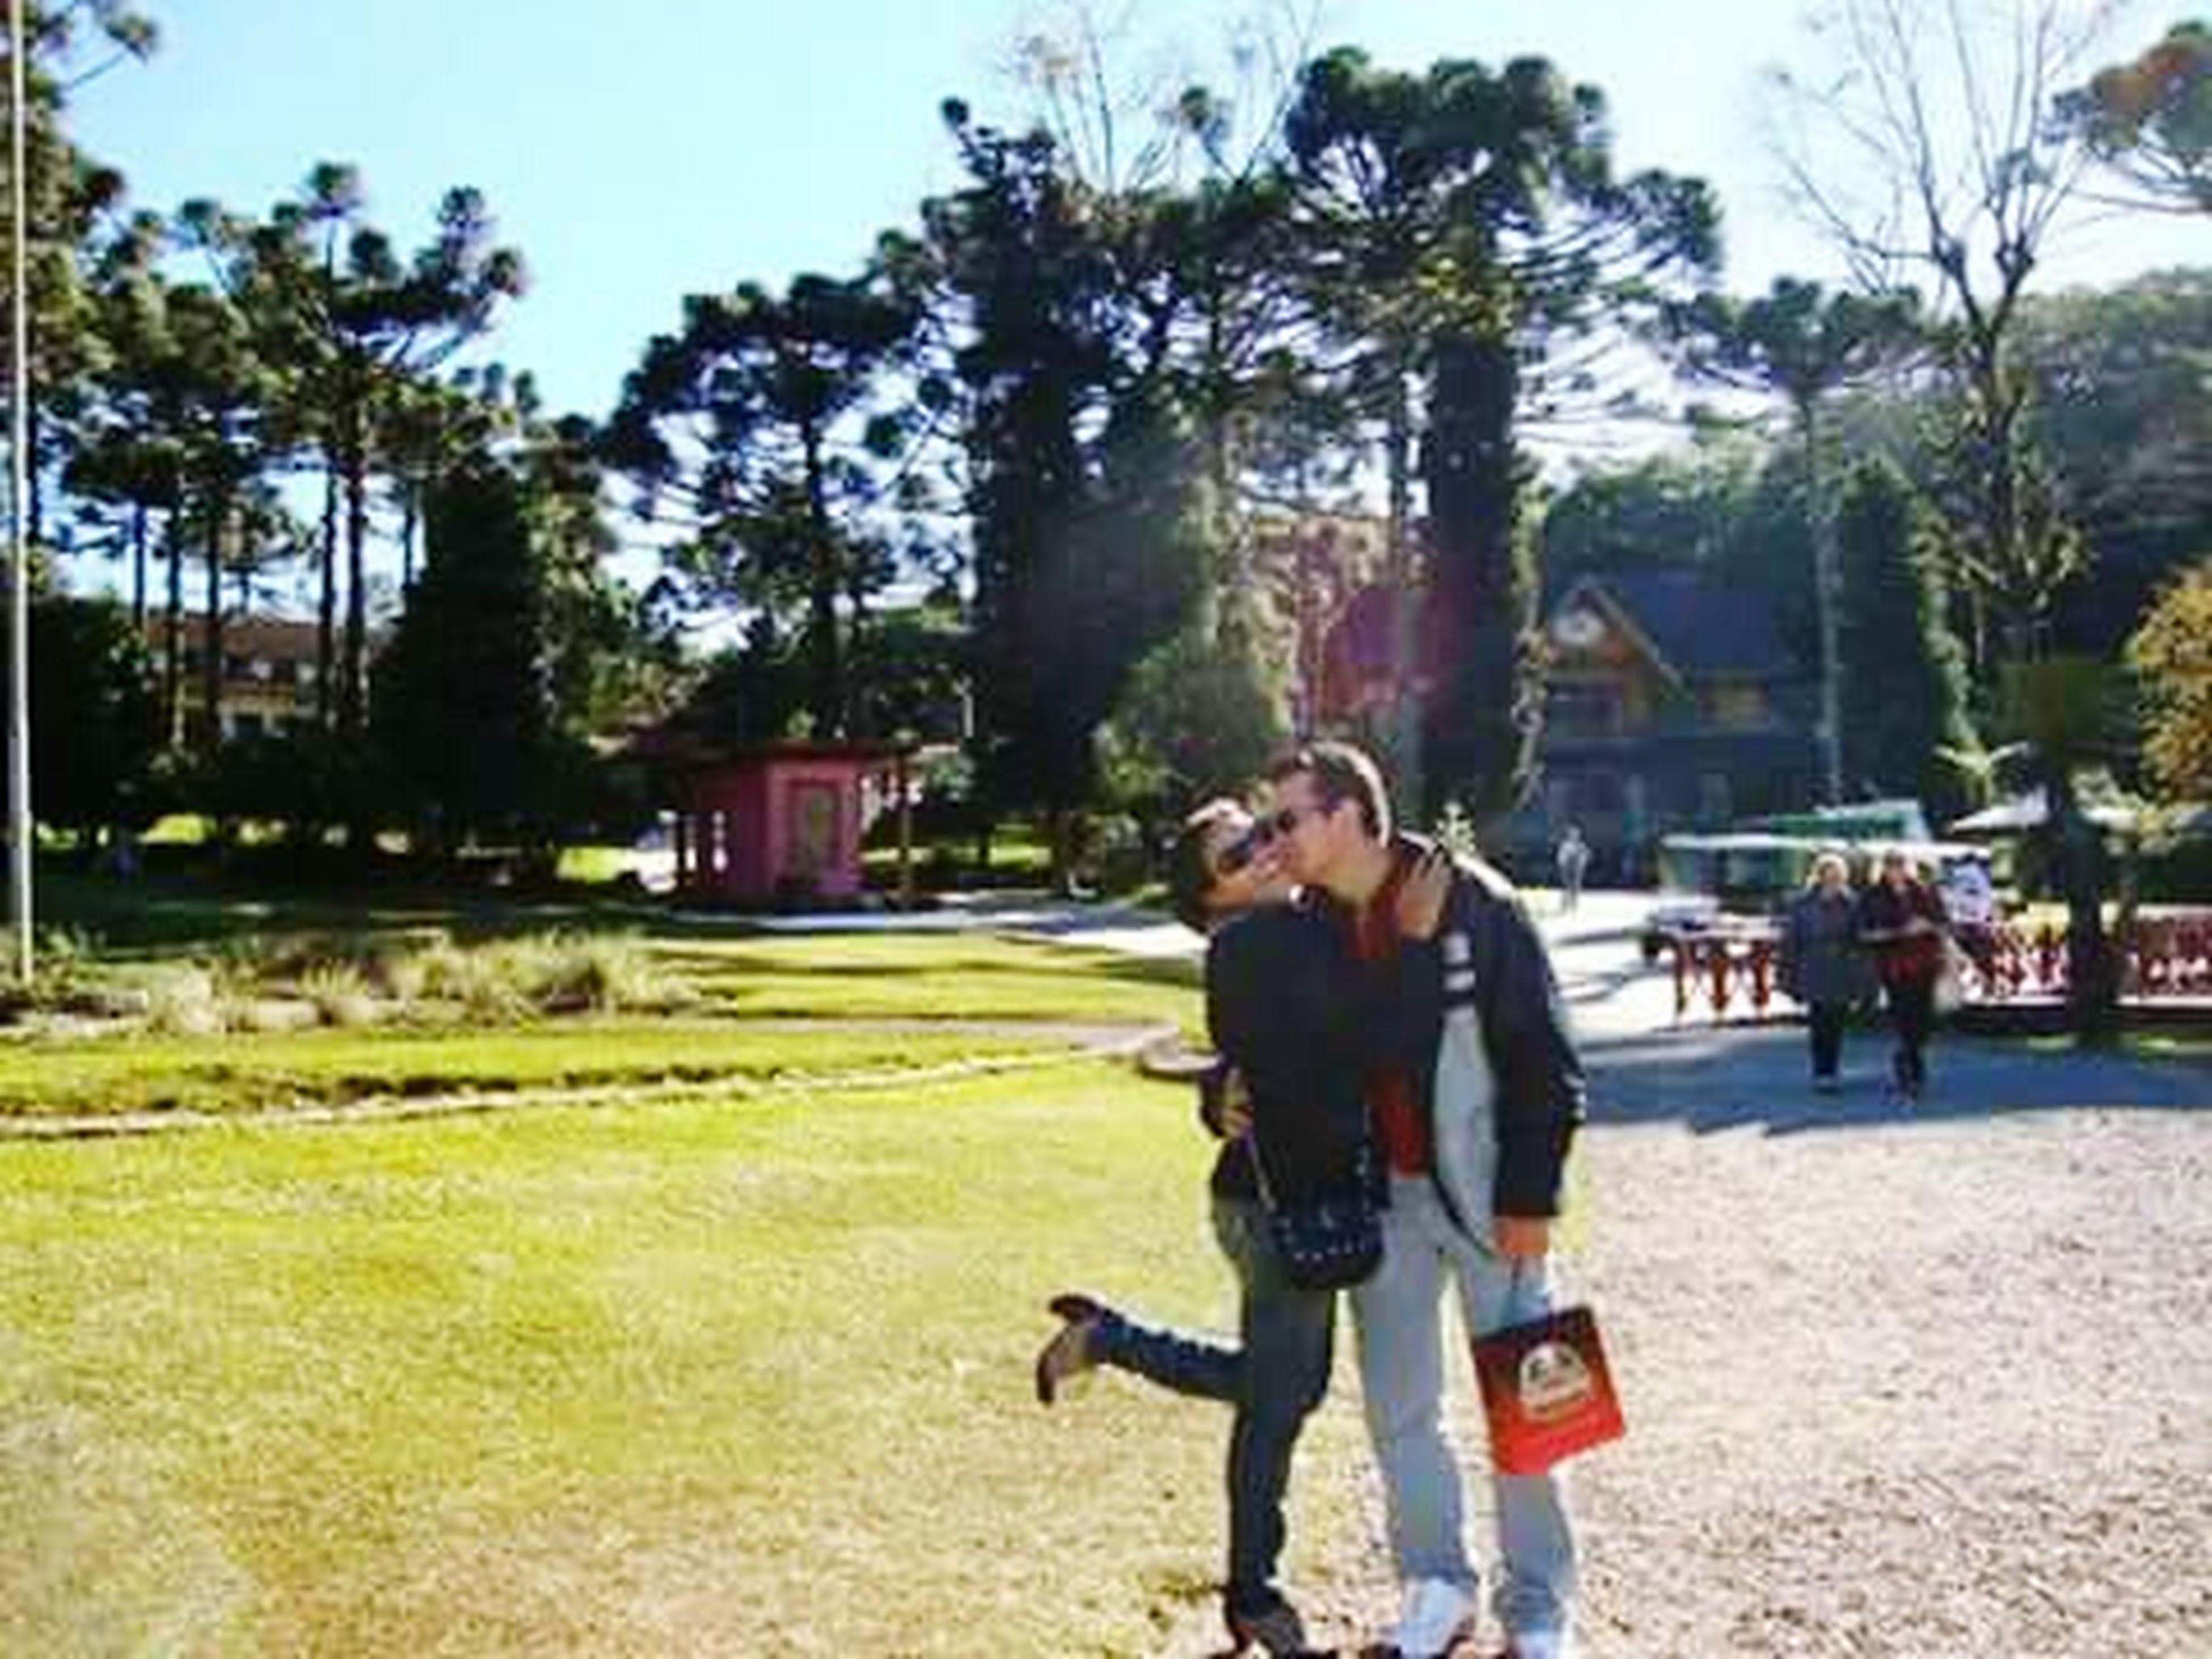 Ferias lindas no Sul do Brasil. LoveInTheAir Gramdo-RS MyLove❤ Mylife♡ Myboyfriend❤ Vocation